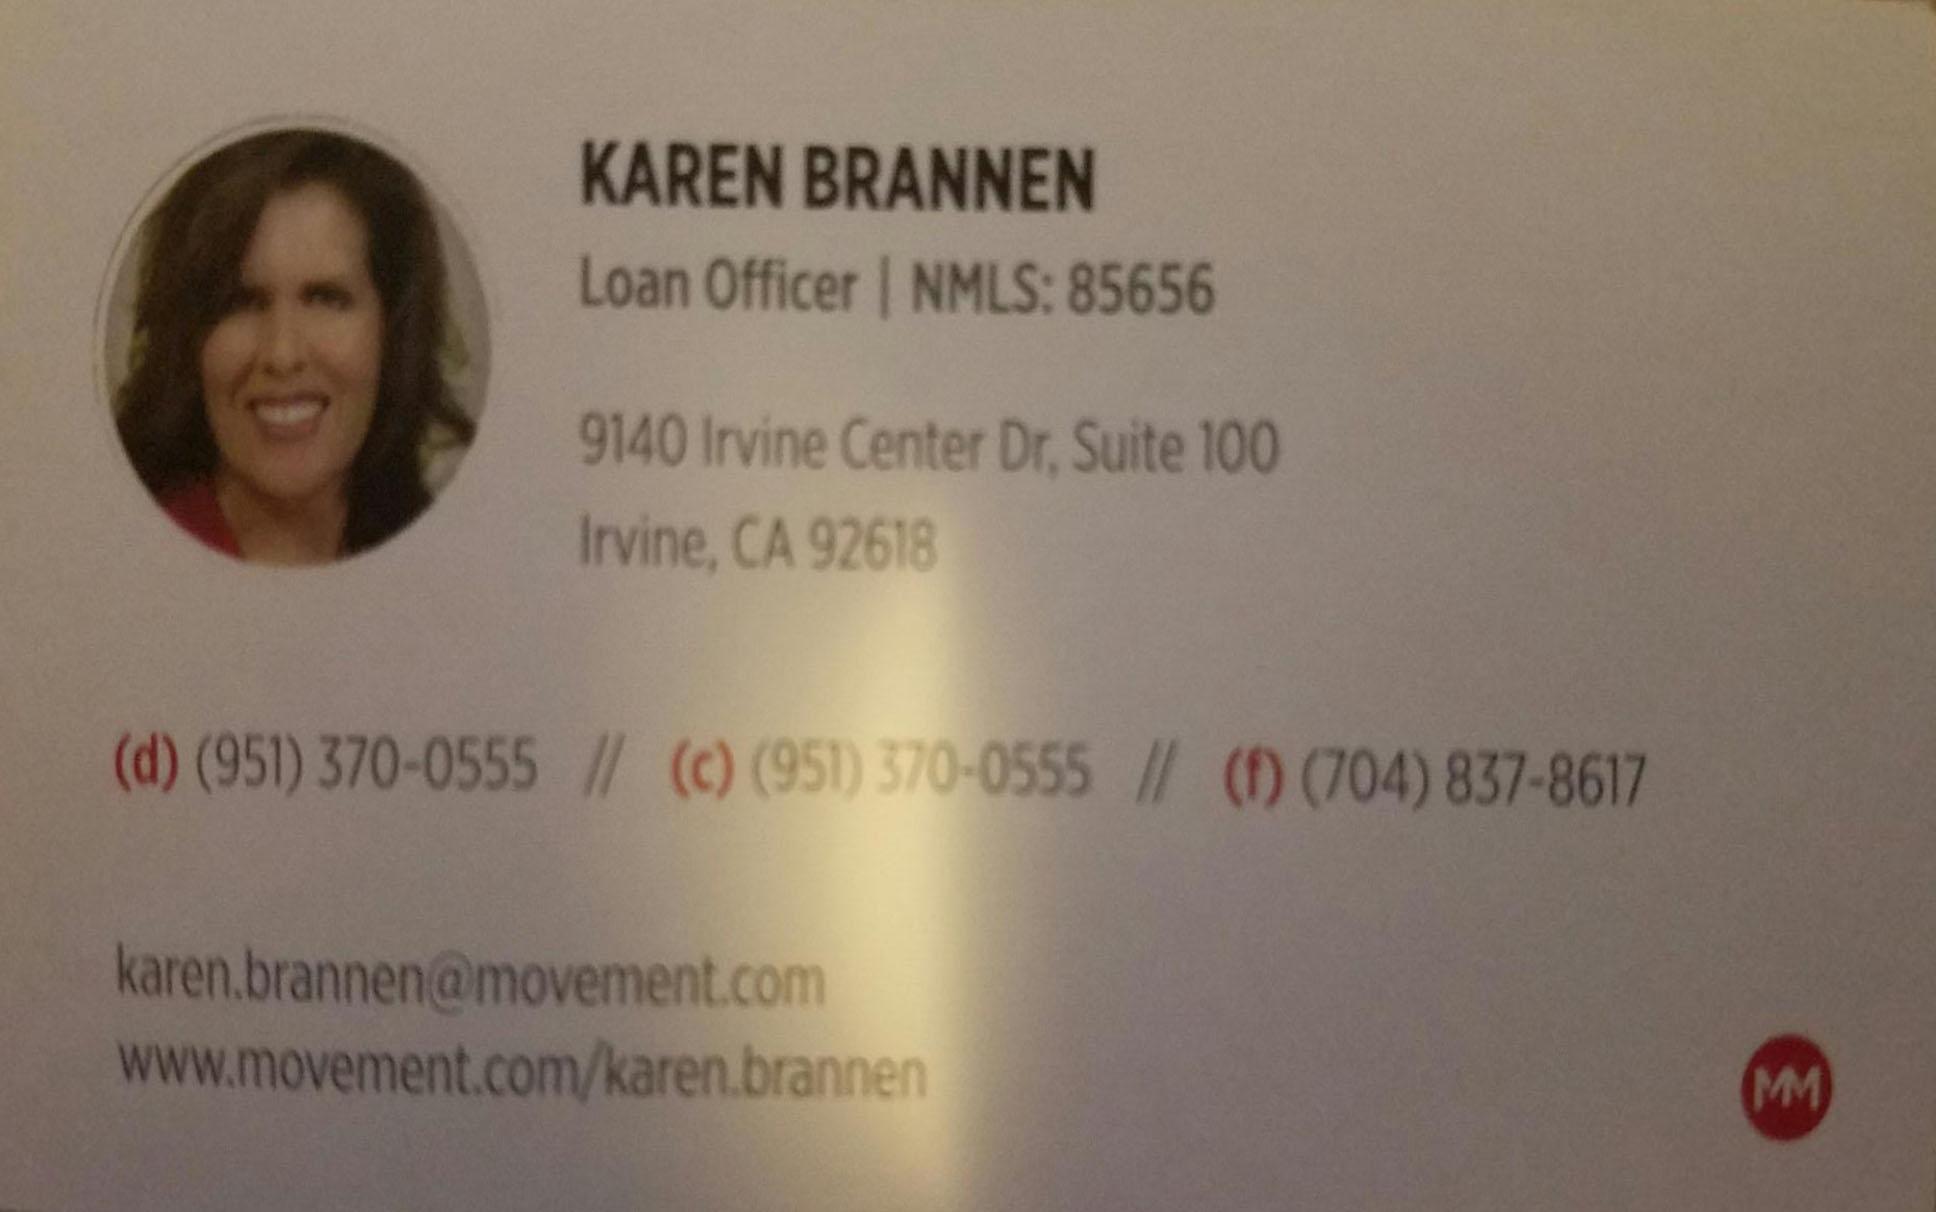 Karen Brannen